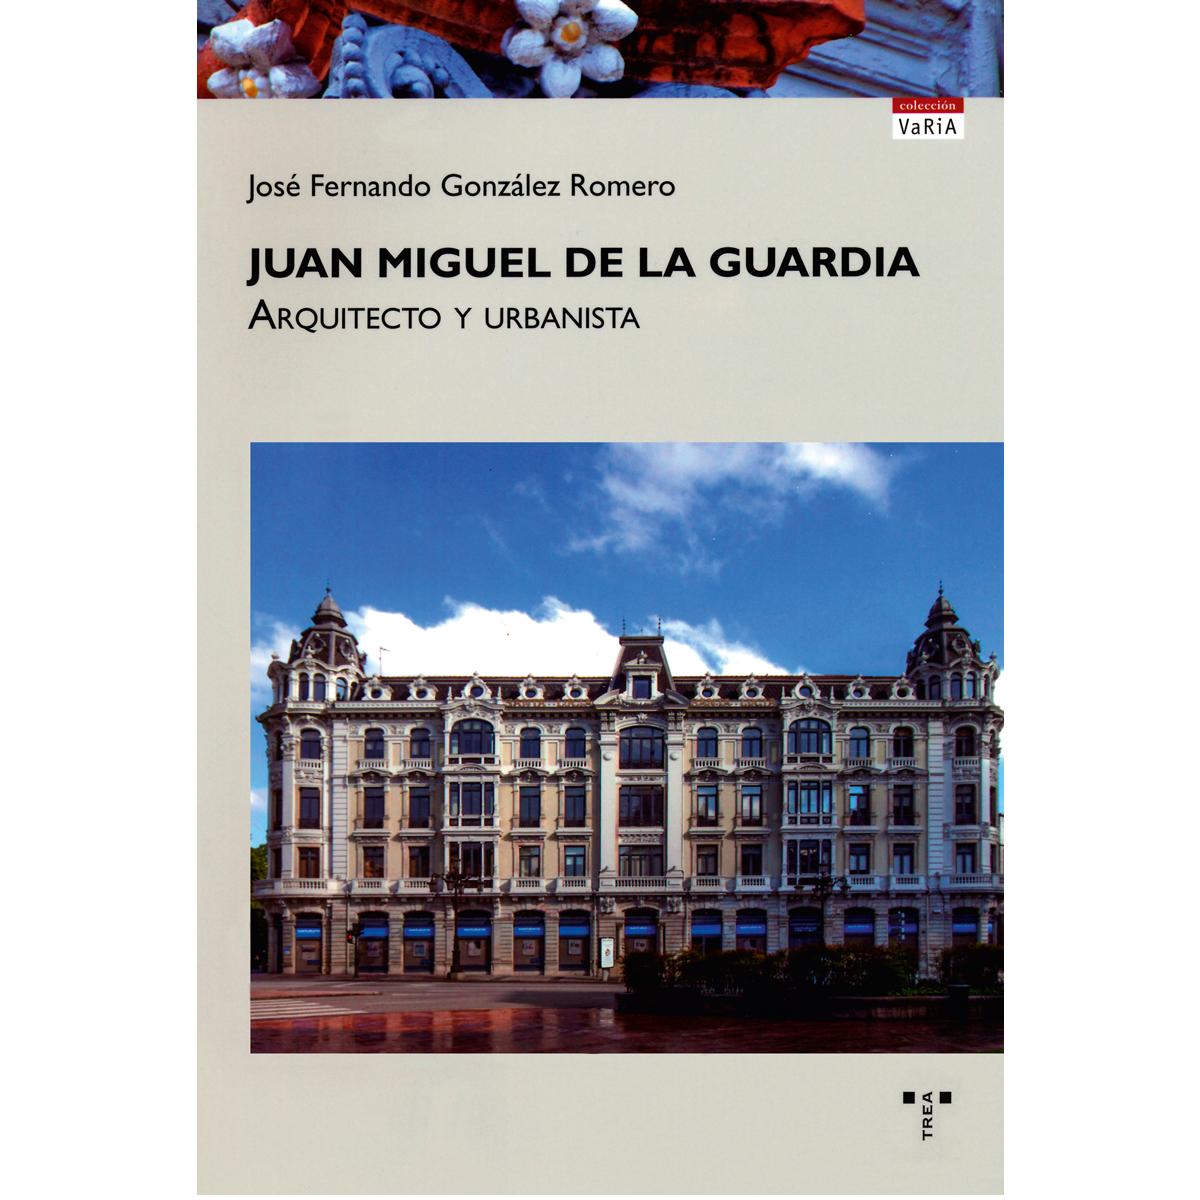 Juan Miguel de la Guardia